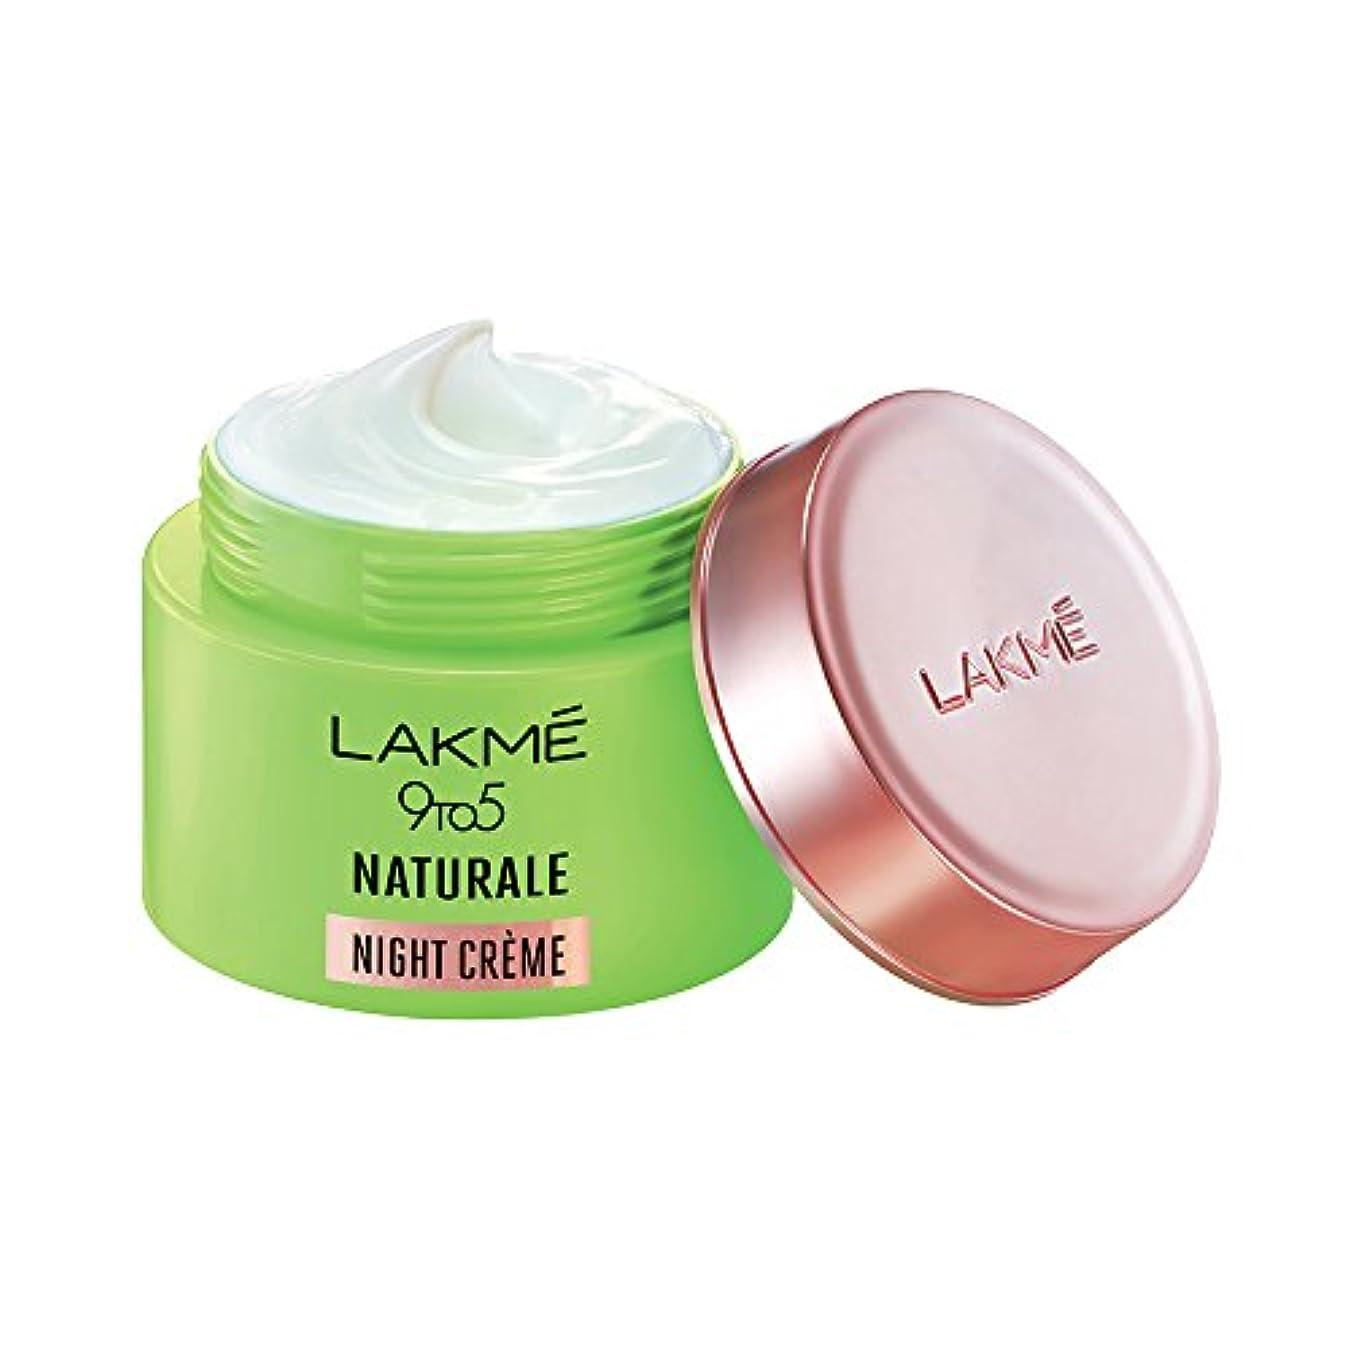 Lakme 9 to 5 Naturale Night Creme, 50 g